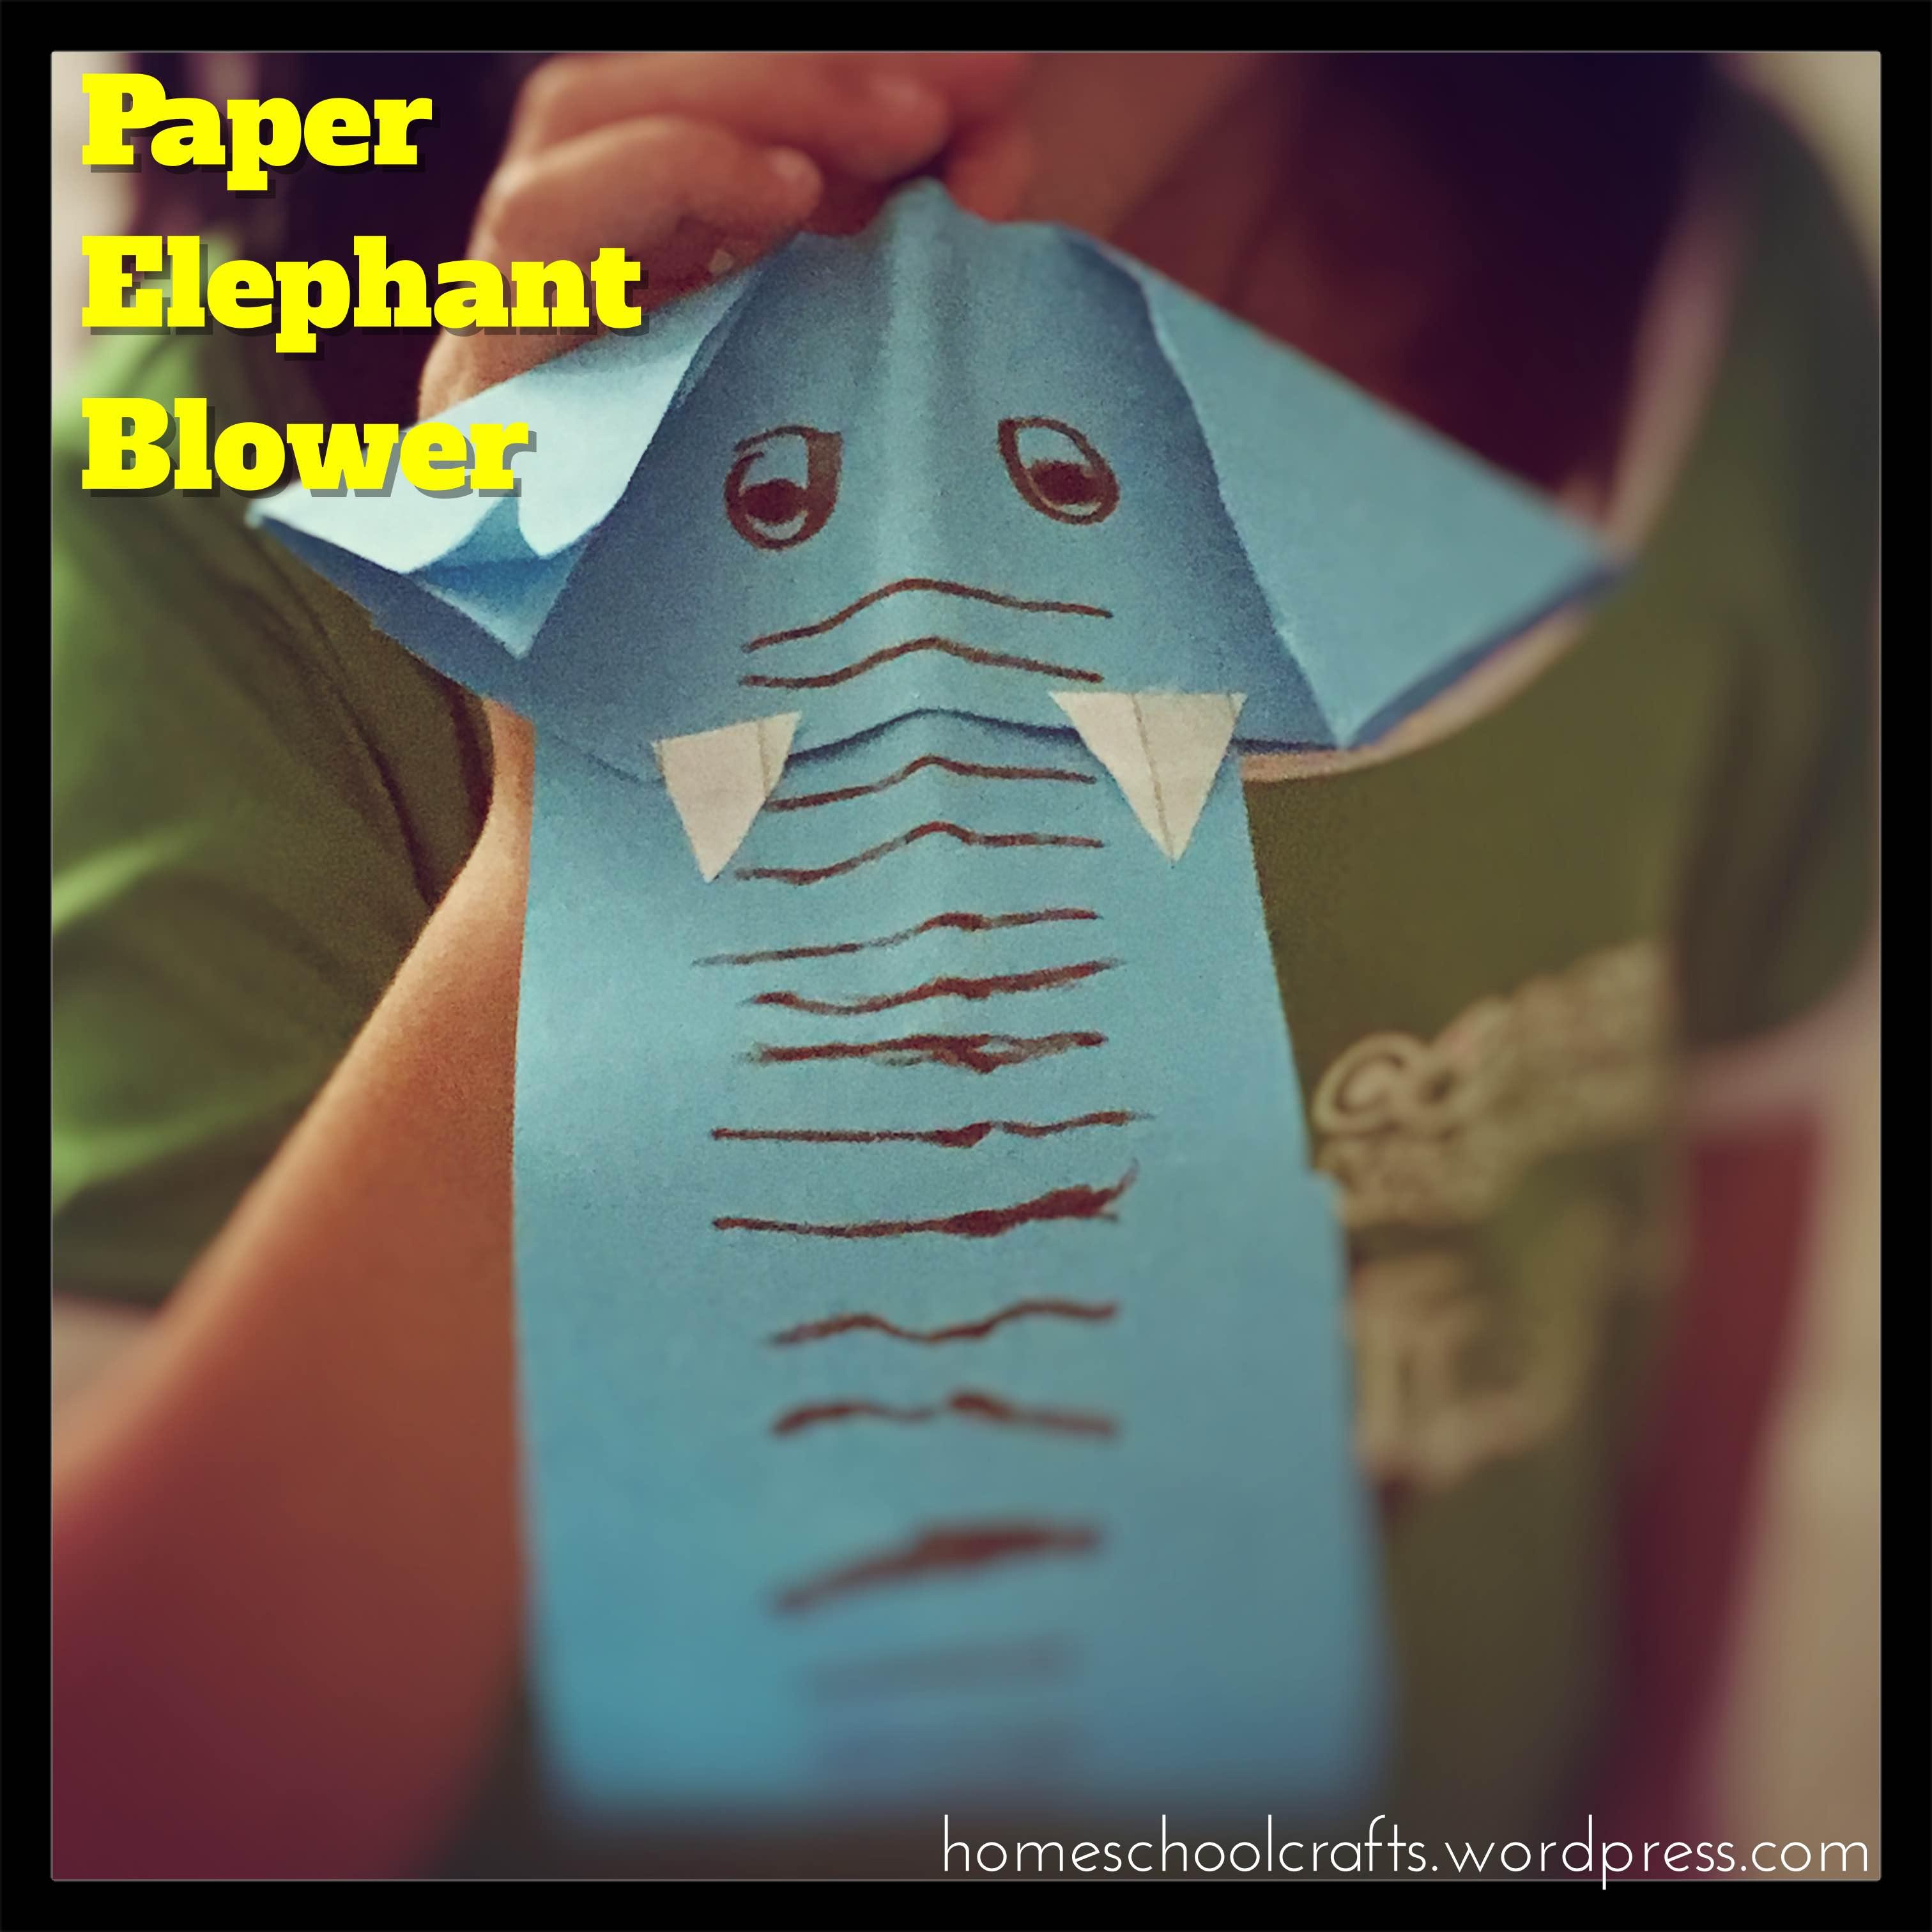 Paper-Elephant-Blower-Homeschool-Crafts